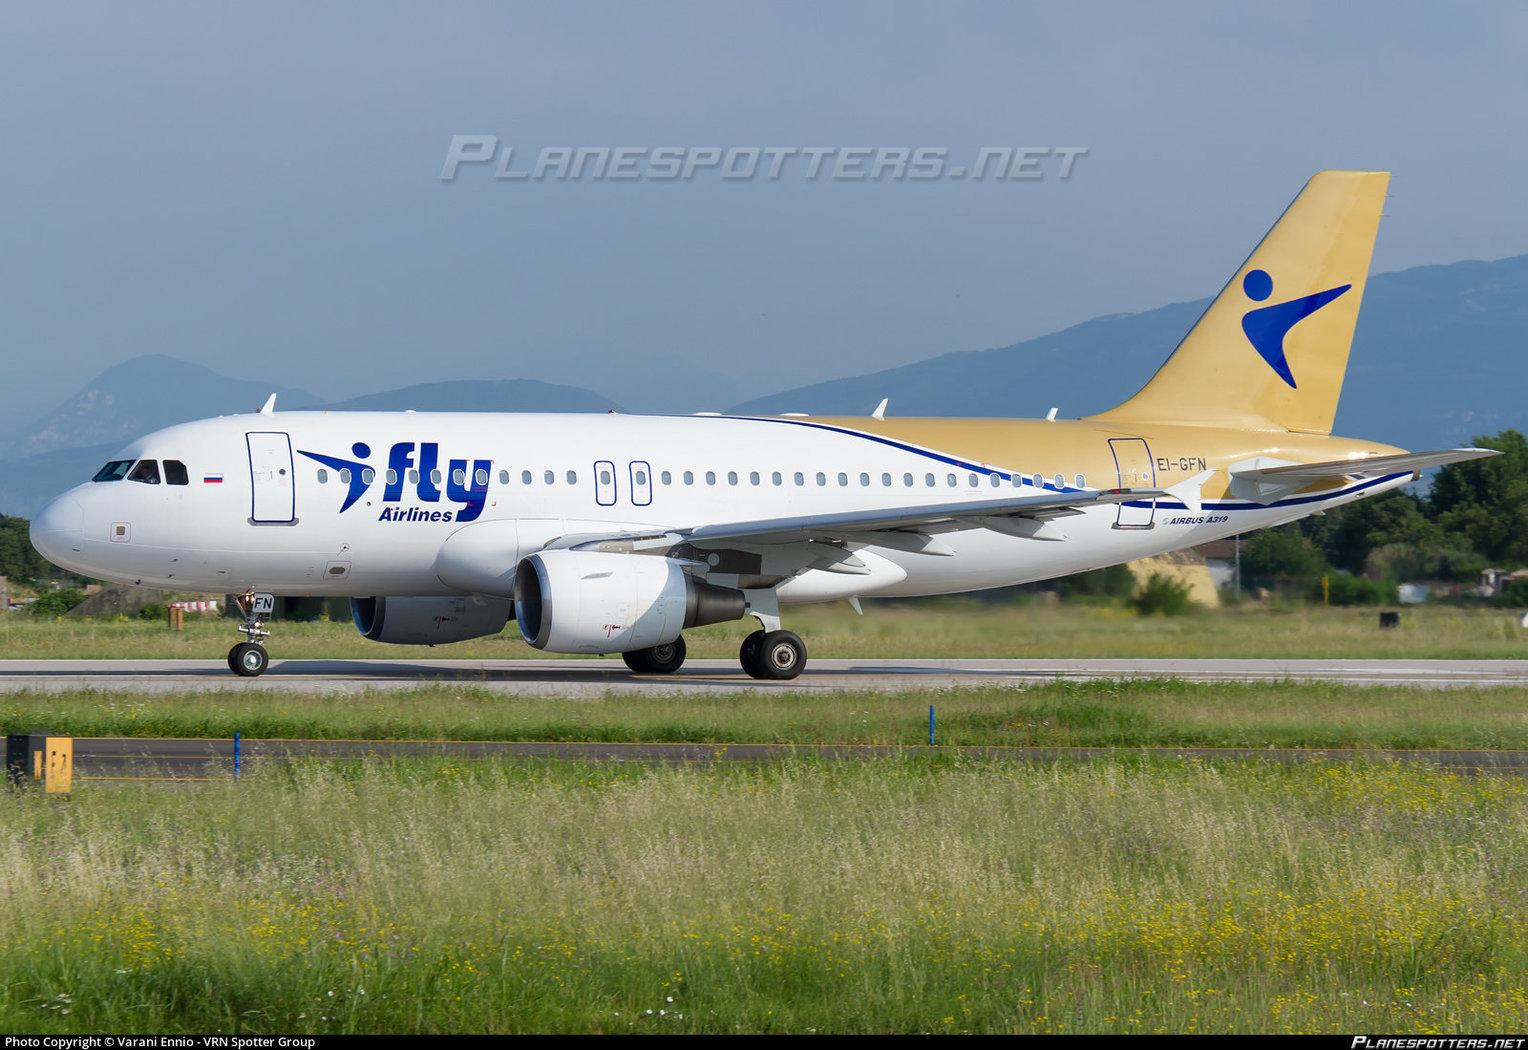 ei-gfn-i-fly-airbus-a319-112_PlanespottersNet_843869_80ed1bb6a5.jpg